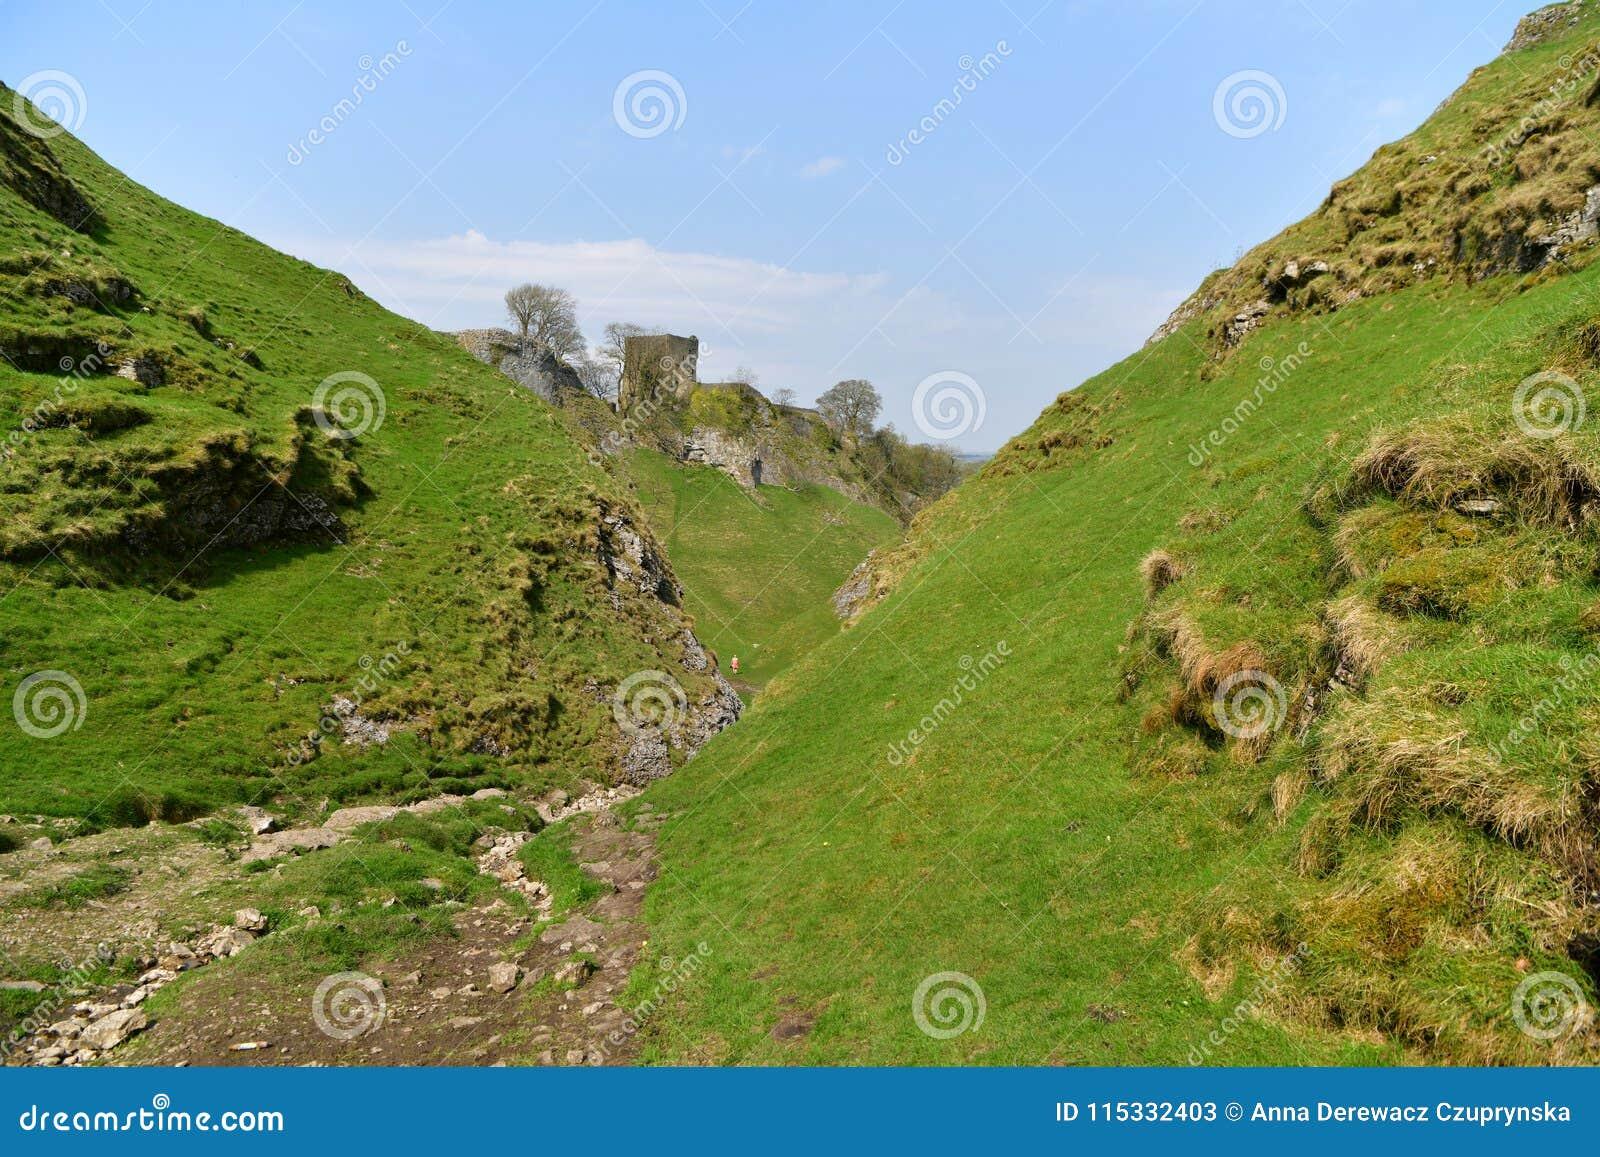 Peak District UK, old historic Peveril Castle, climb